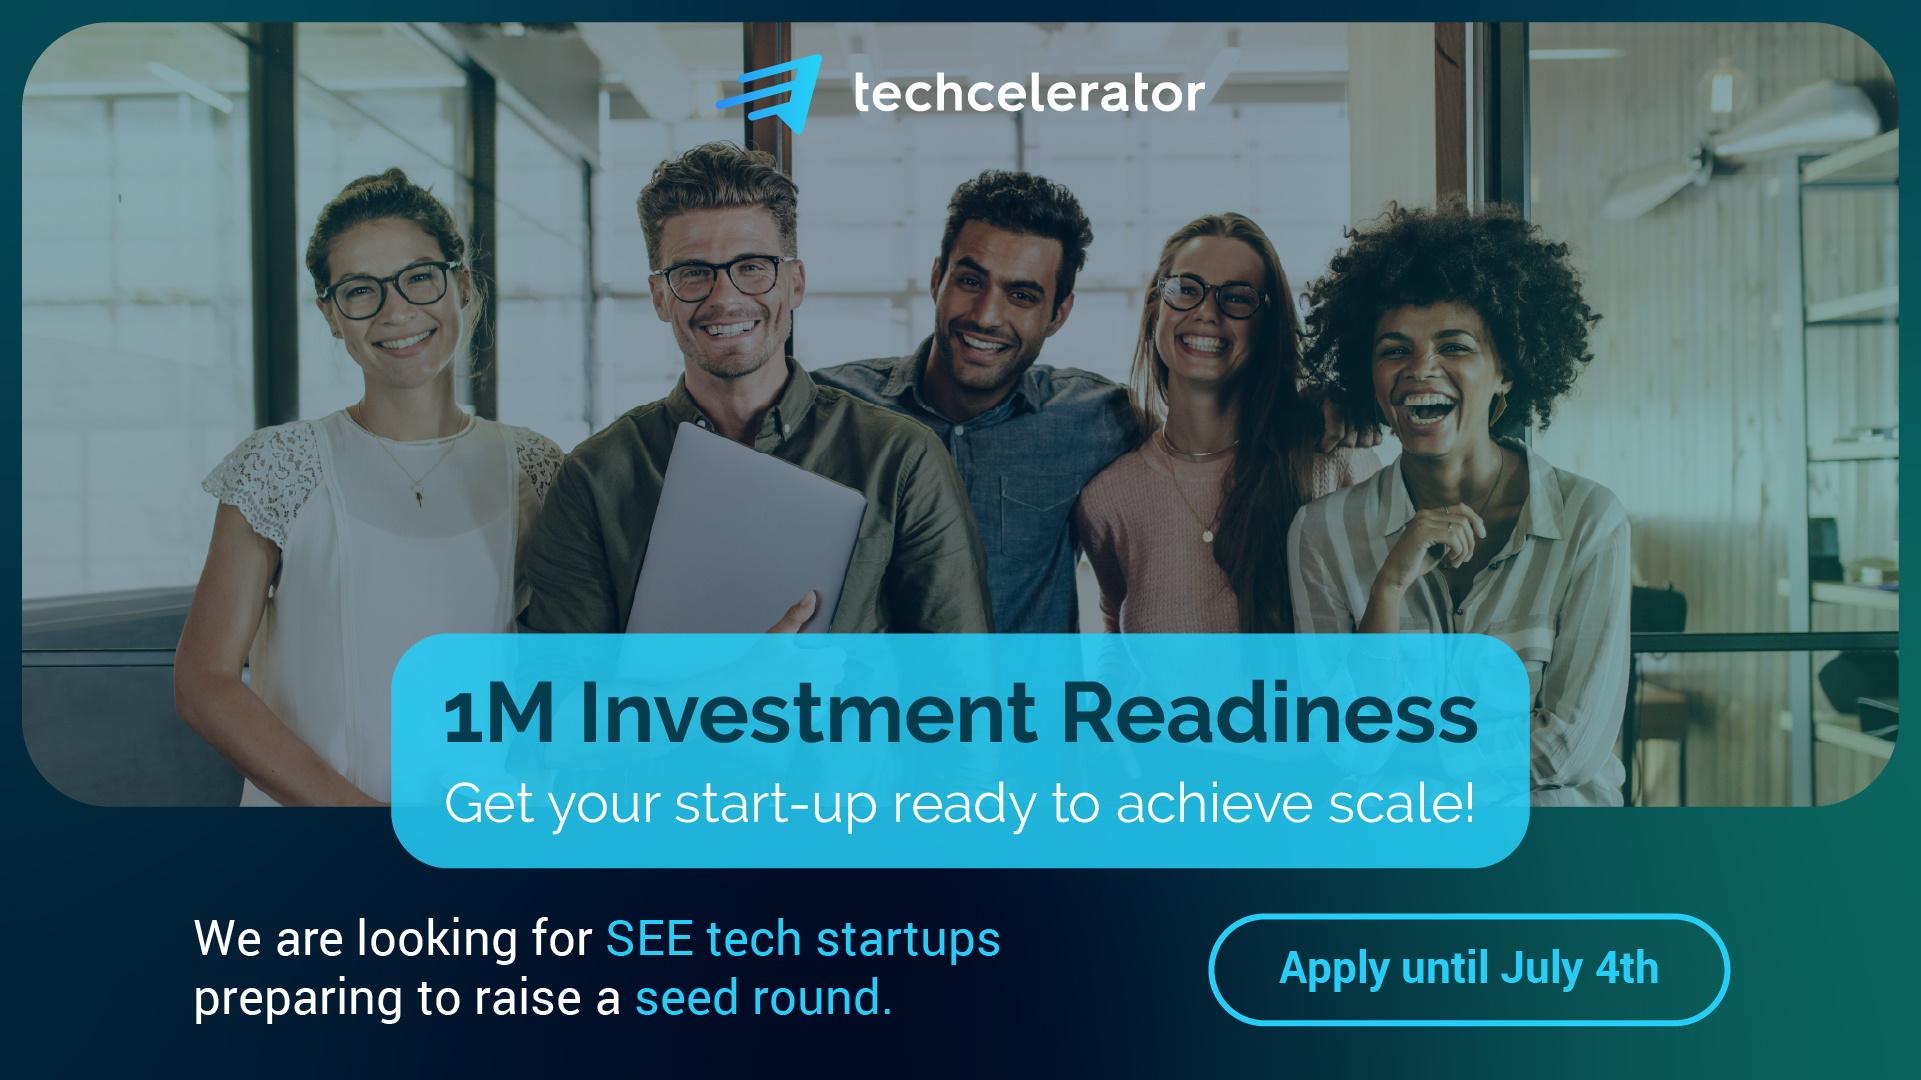 Techcelerator is launching